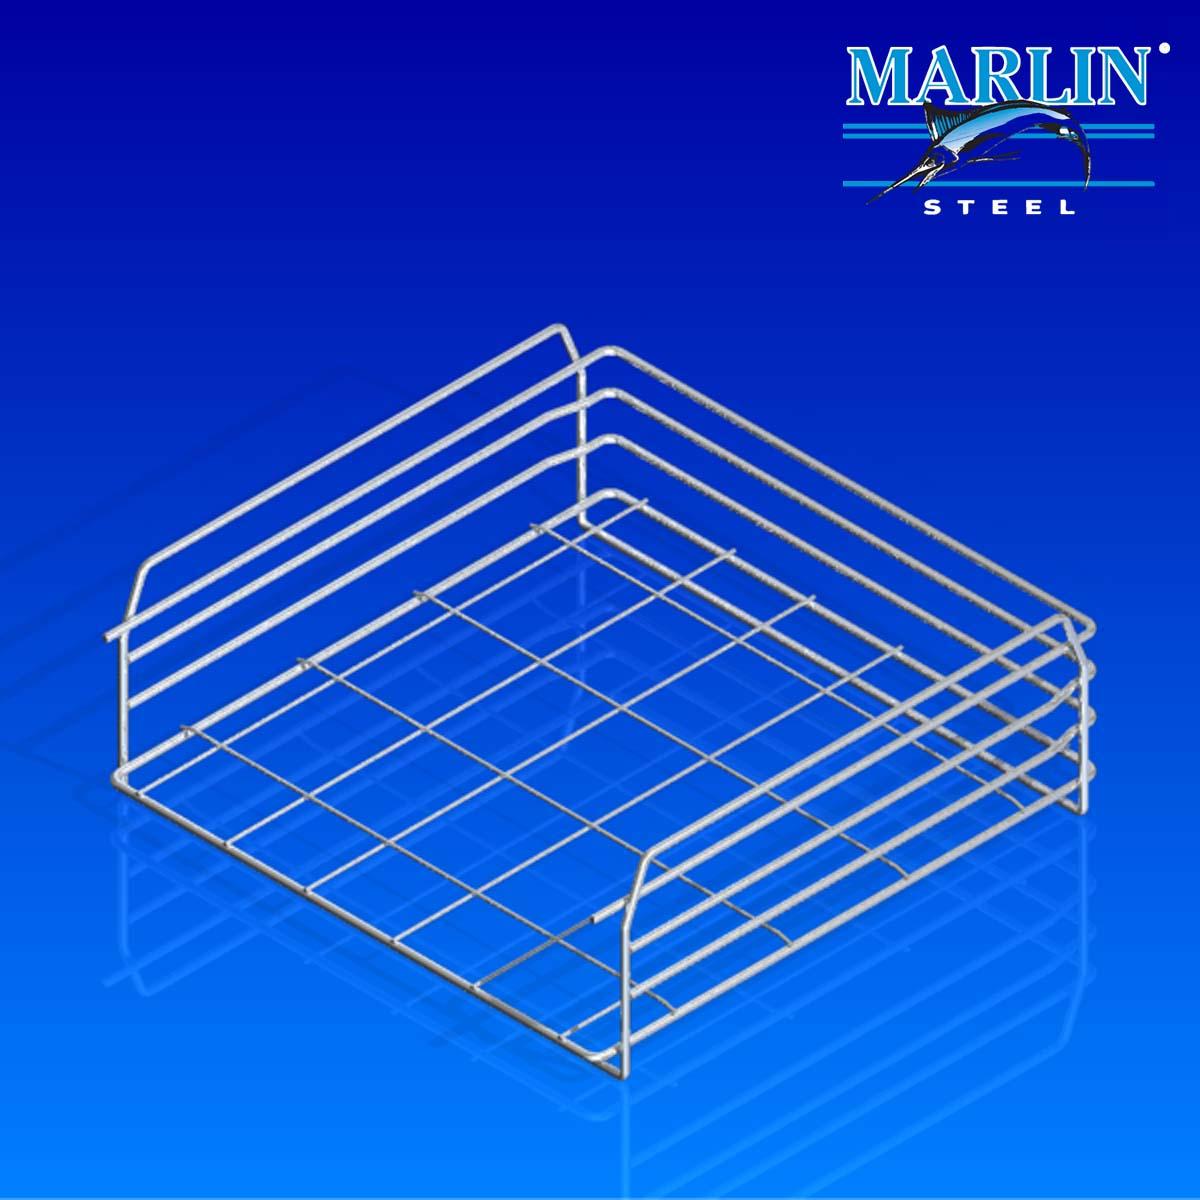 Marlin Steel Basket with Handles 741001